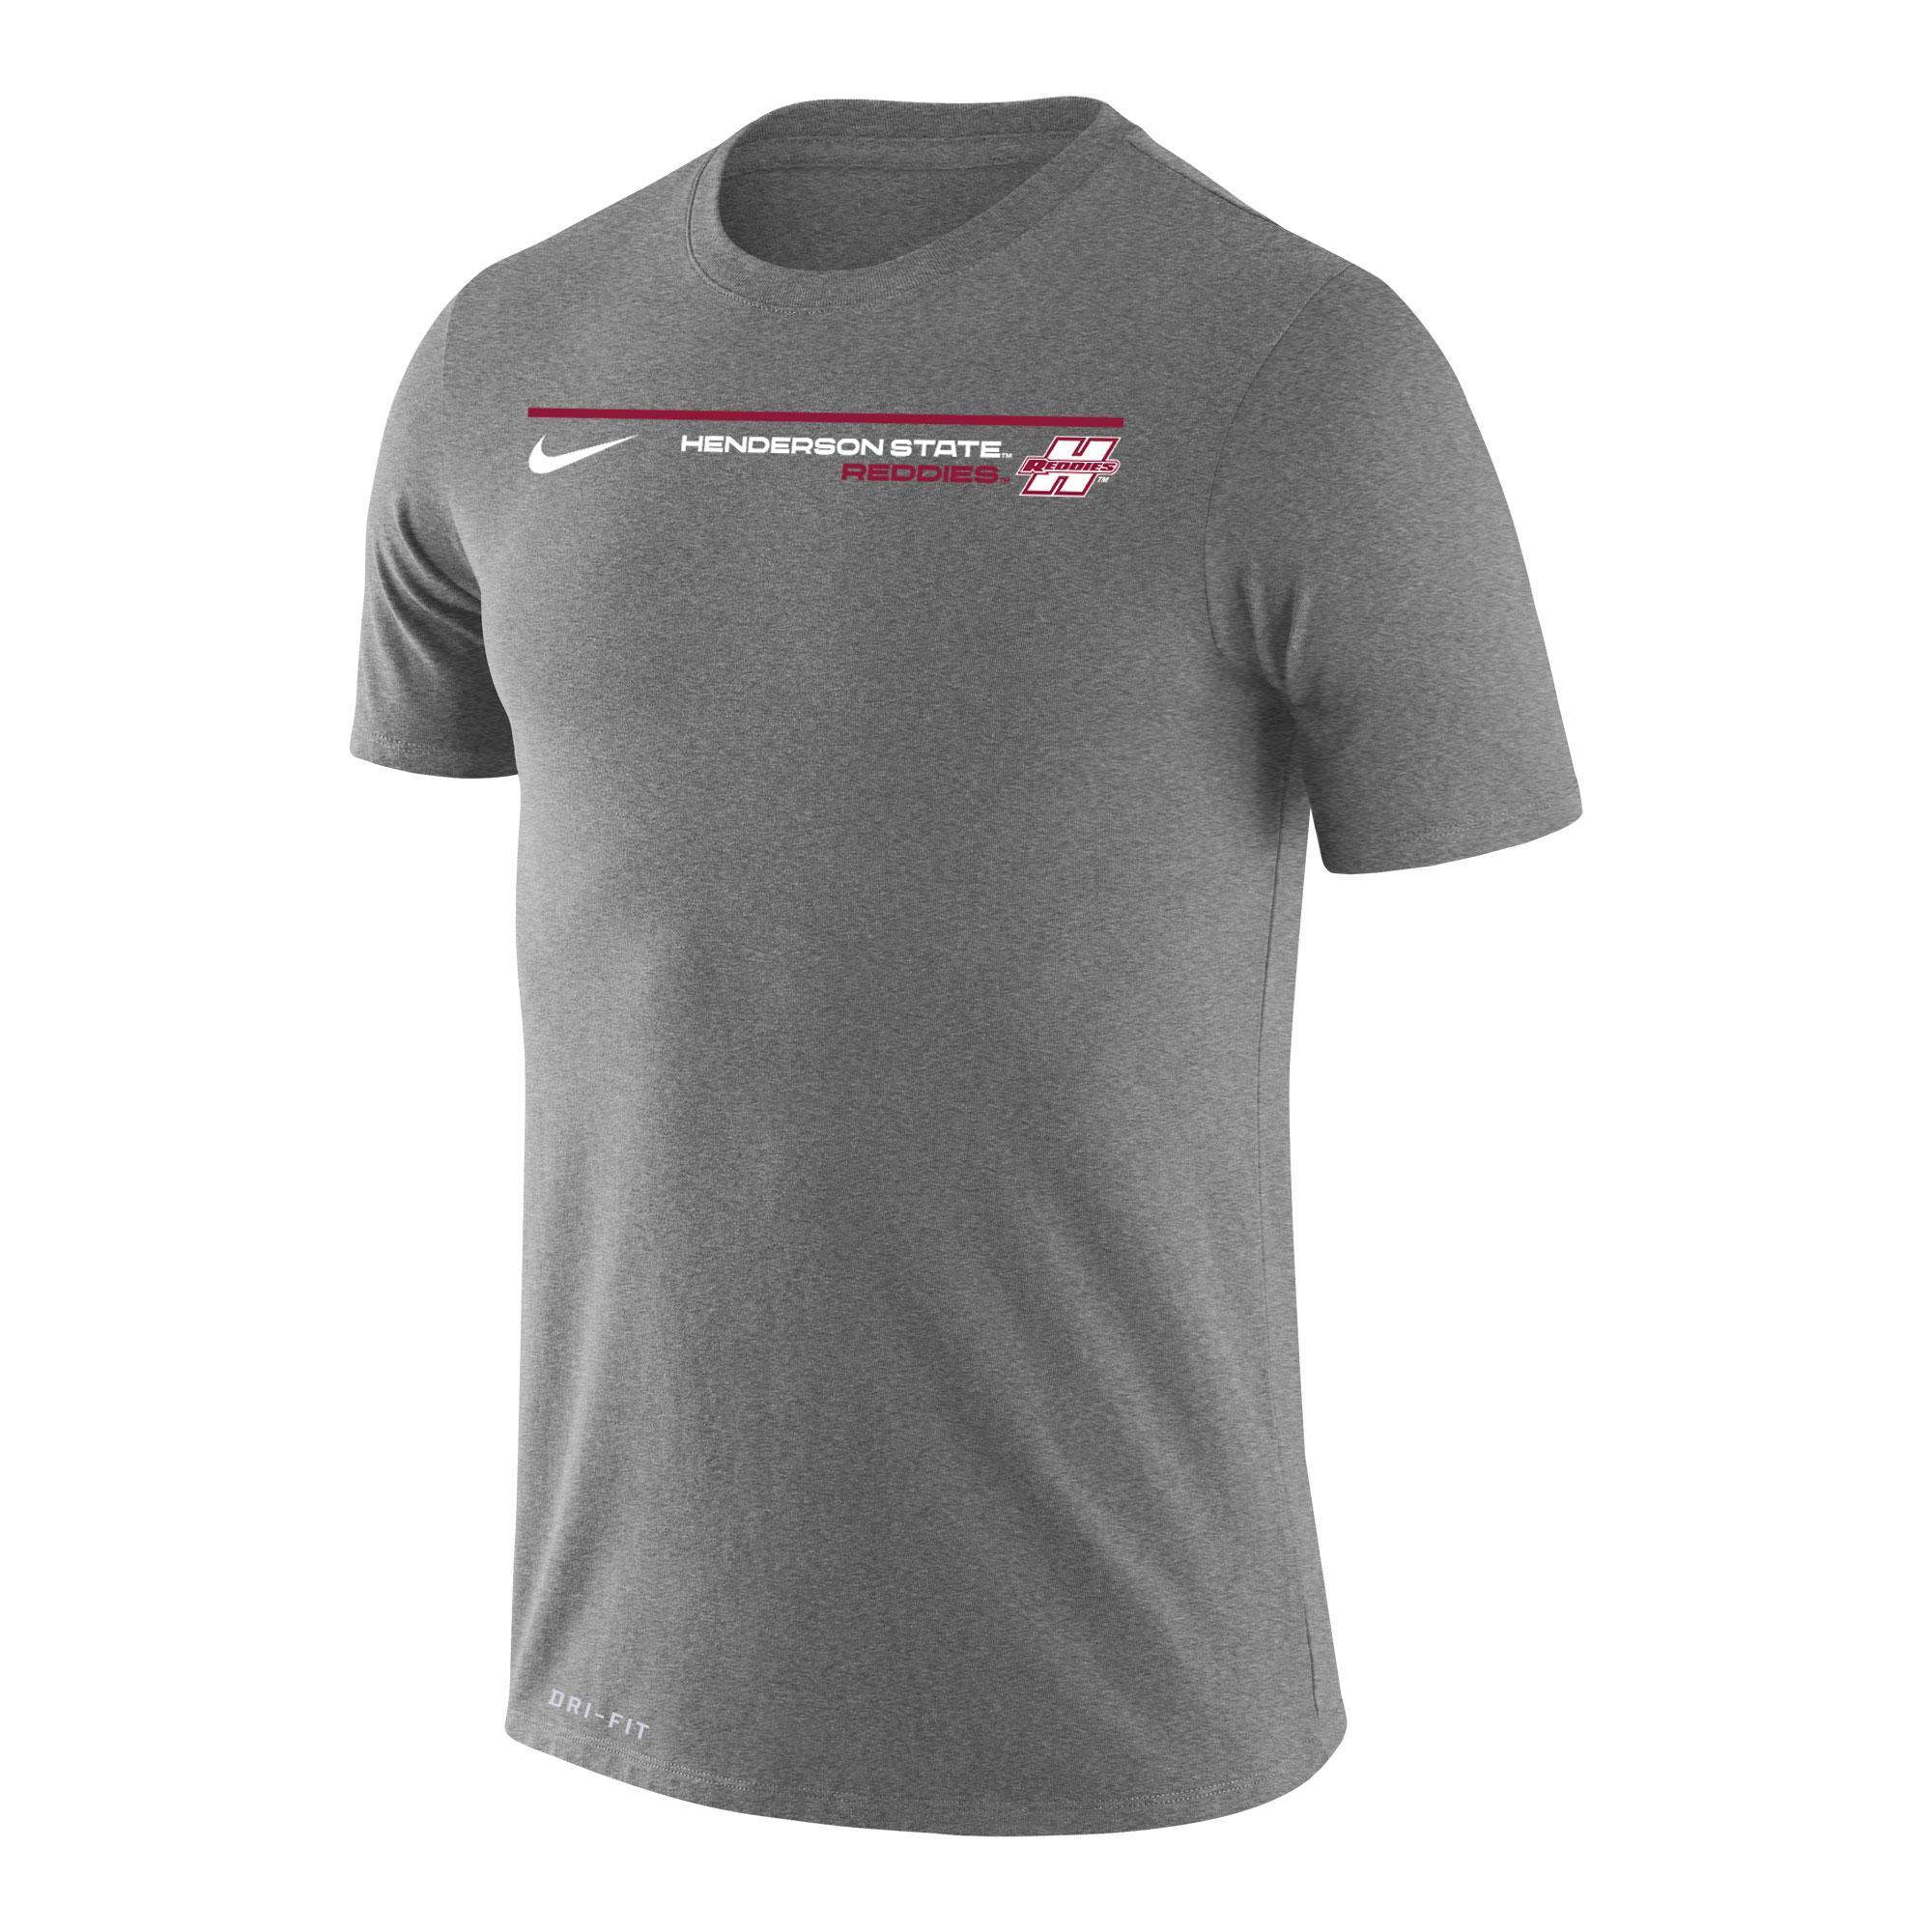 image of: Henderson State Reddies Dri-Fit Nike Legend Short Sleeve T-Shirt